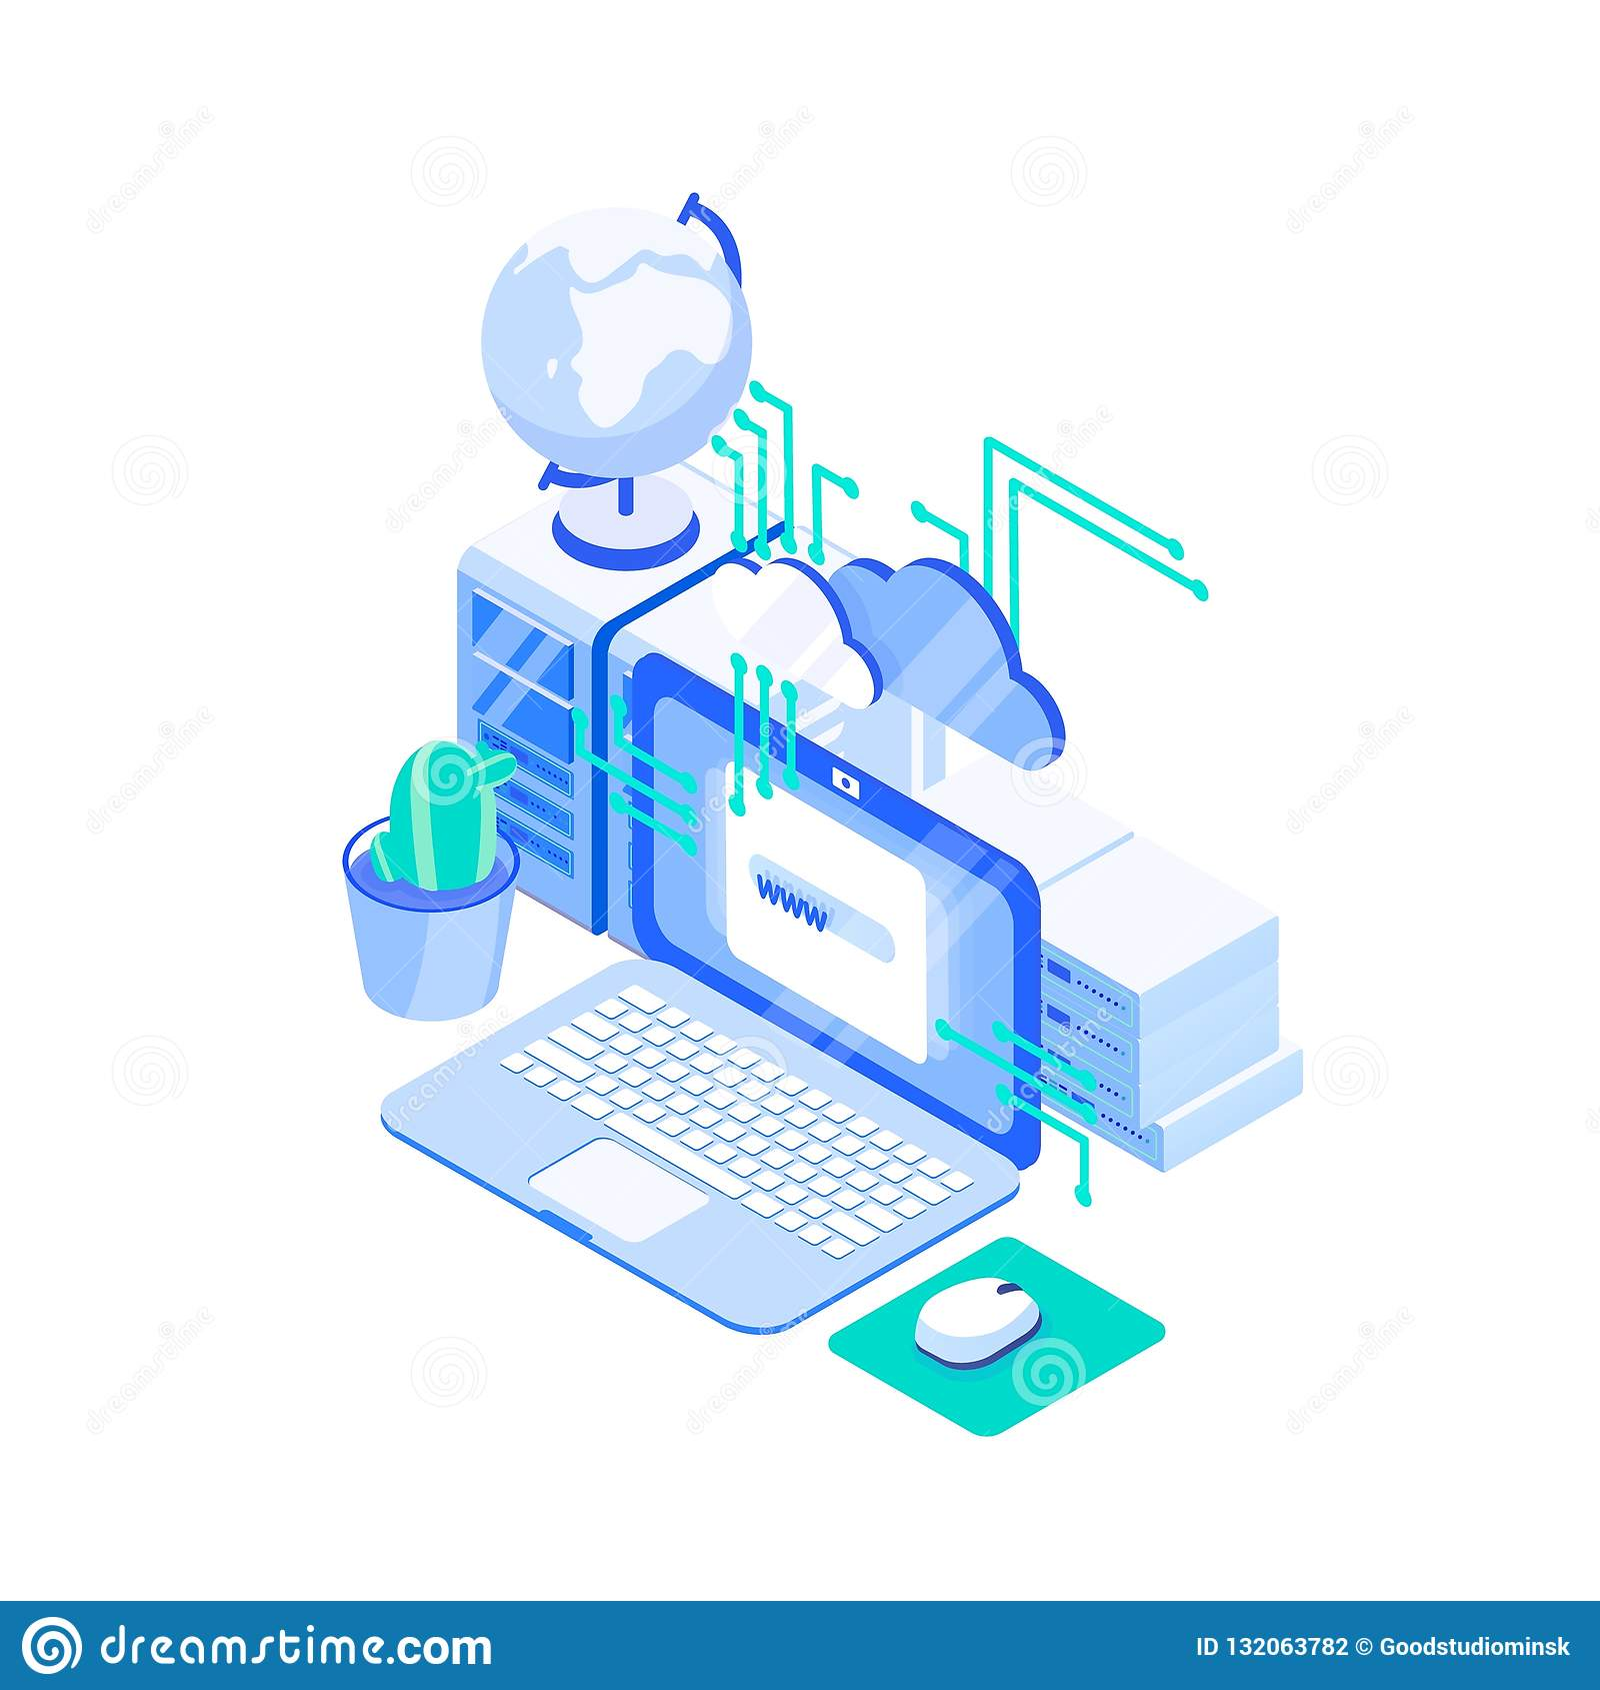 Laptop computer, stapel servers en bol Web of Internet-het ontvangen technologie, online websiteondersteunende dienst, wolk